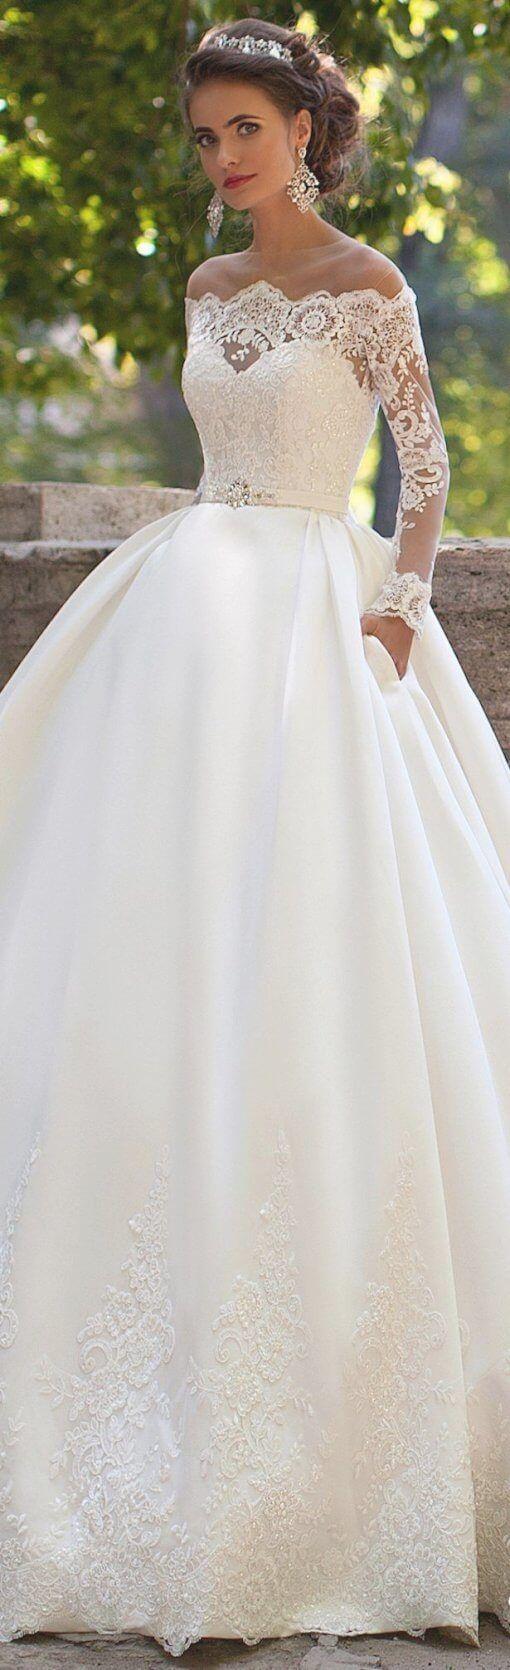 Best 30 Beautiful White Wedding Dress Gold Embroidery Best Inspiration Wedding Dress Long Sleeve Wedding Dresses Bridal Dresses [ 1670 x 510 Pixel ]